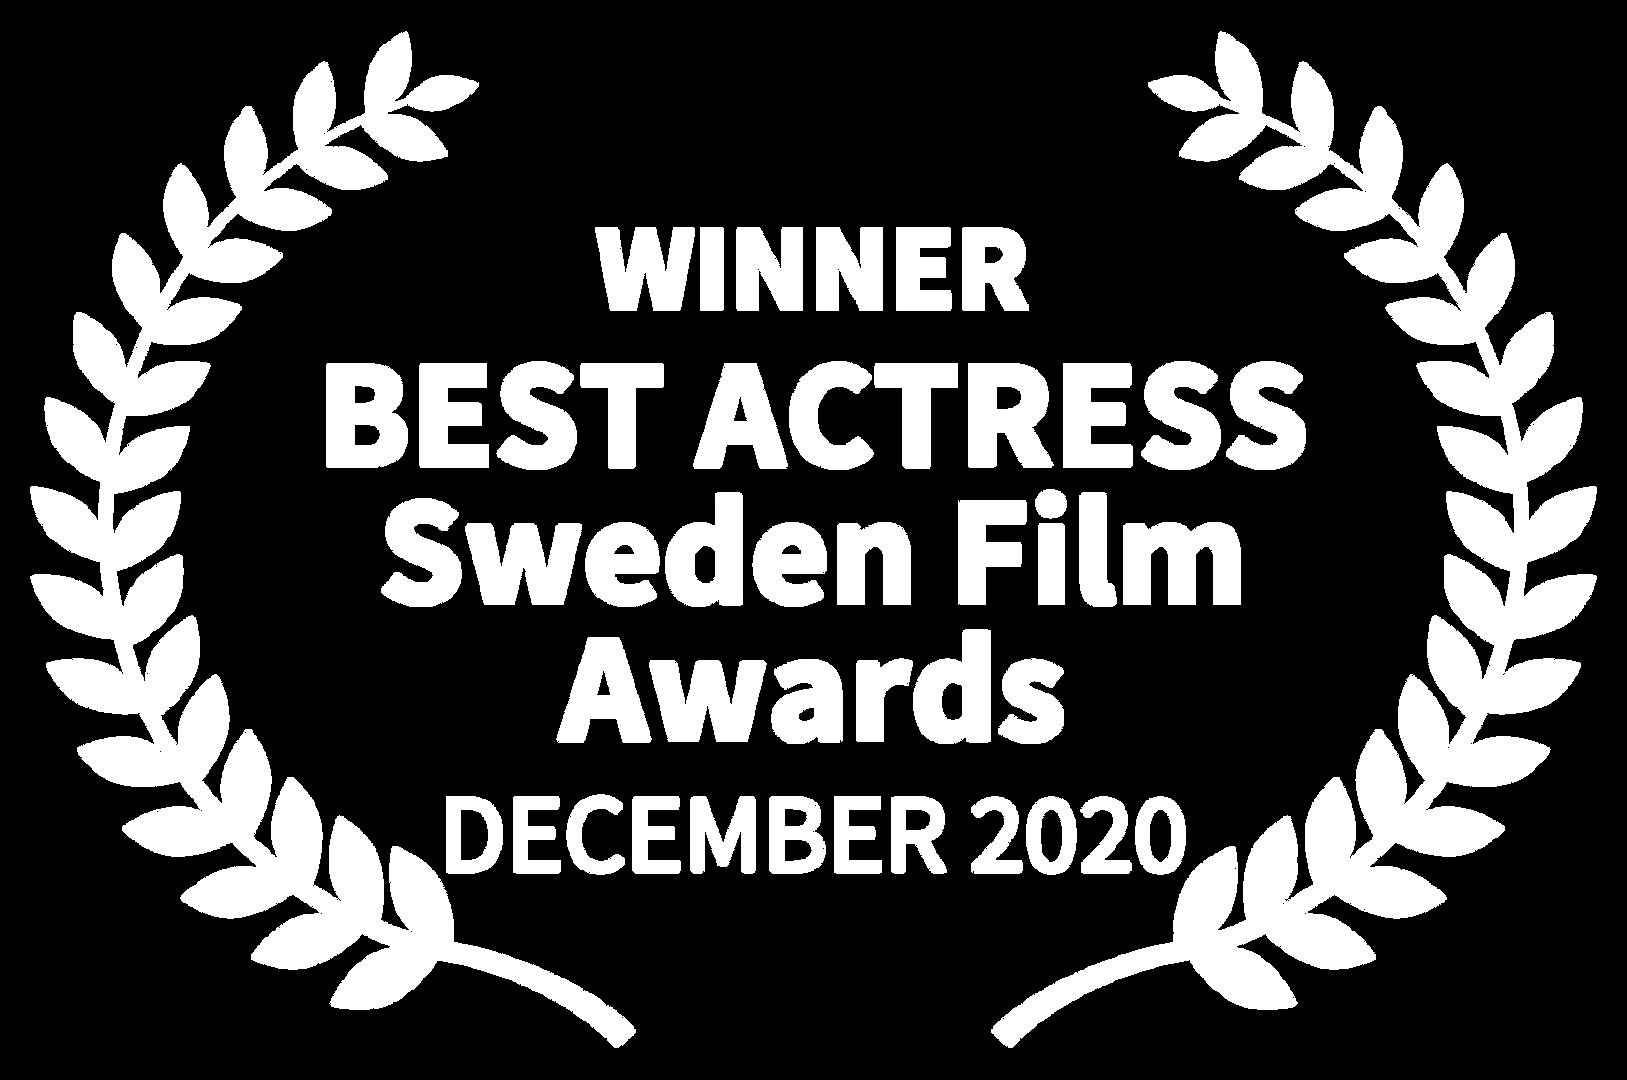 WINNER - BEST ACTRESS Sweden Film Awards